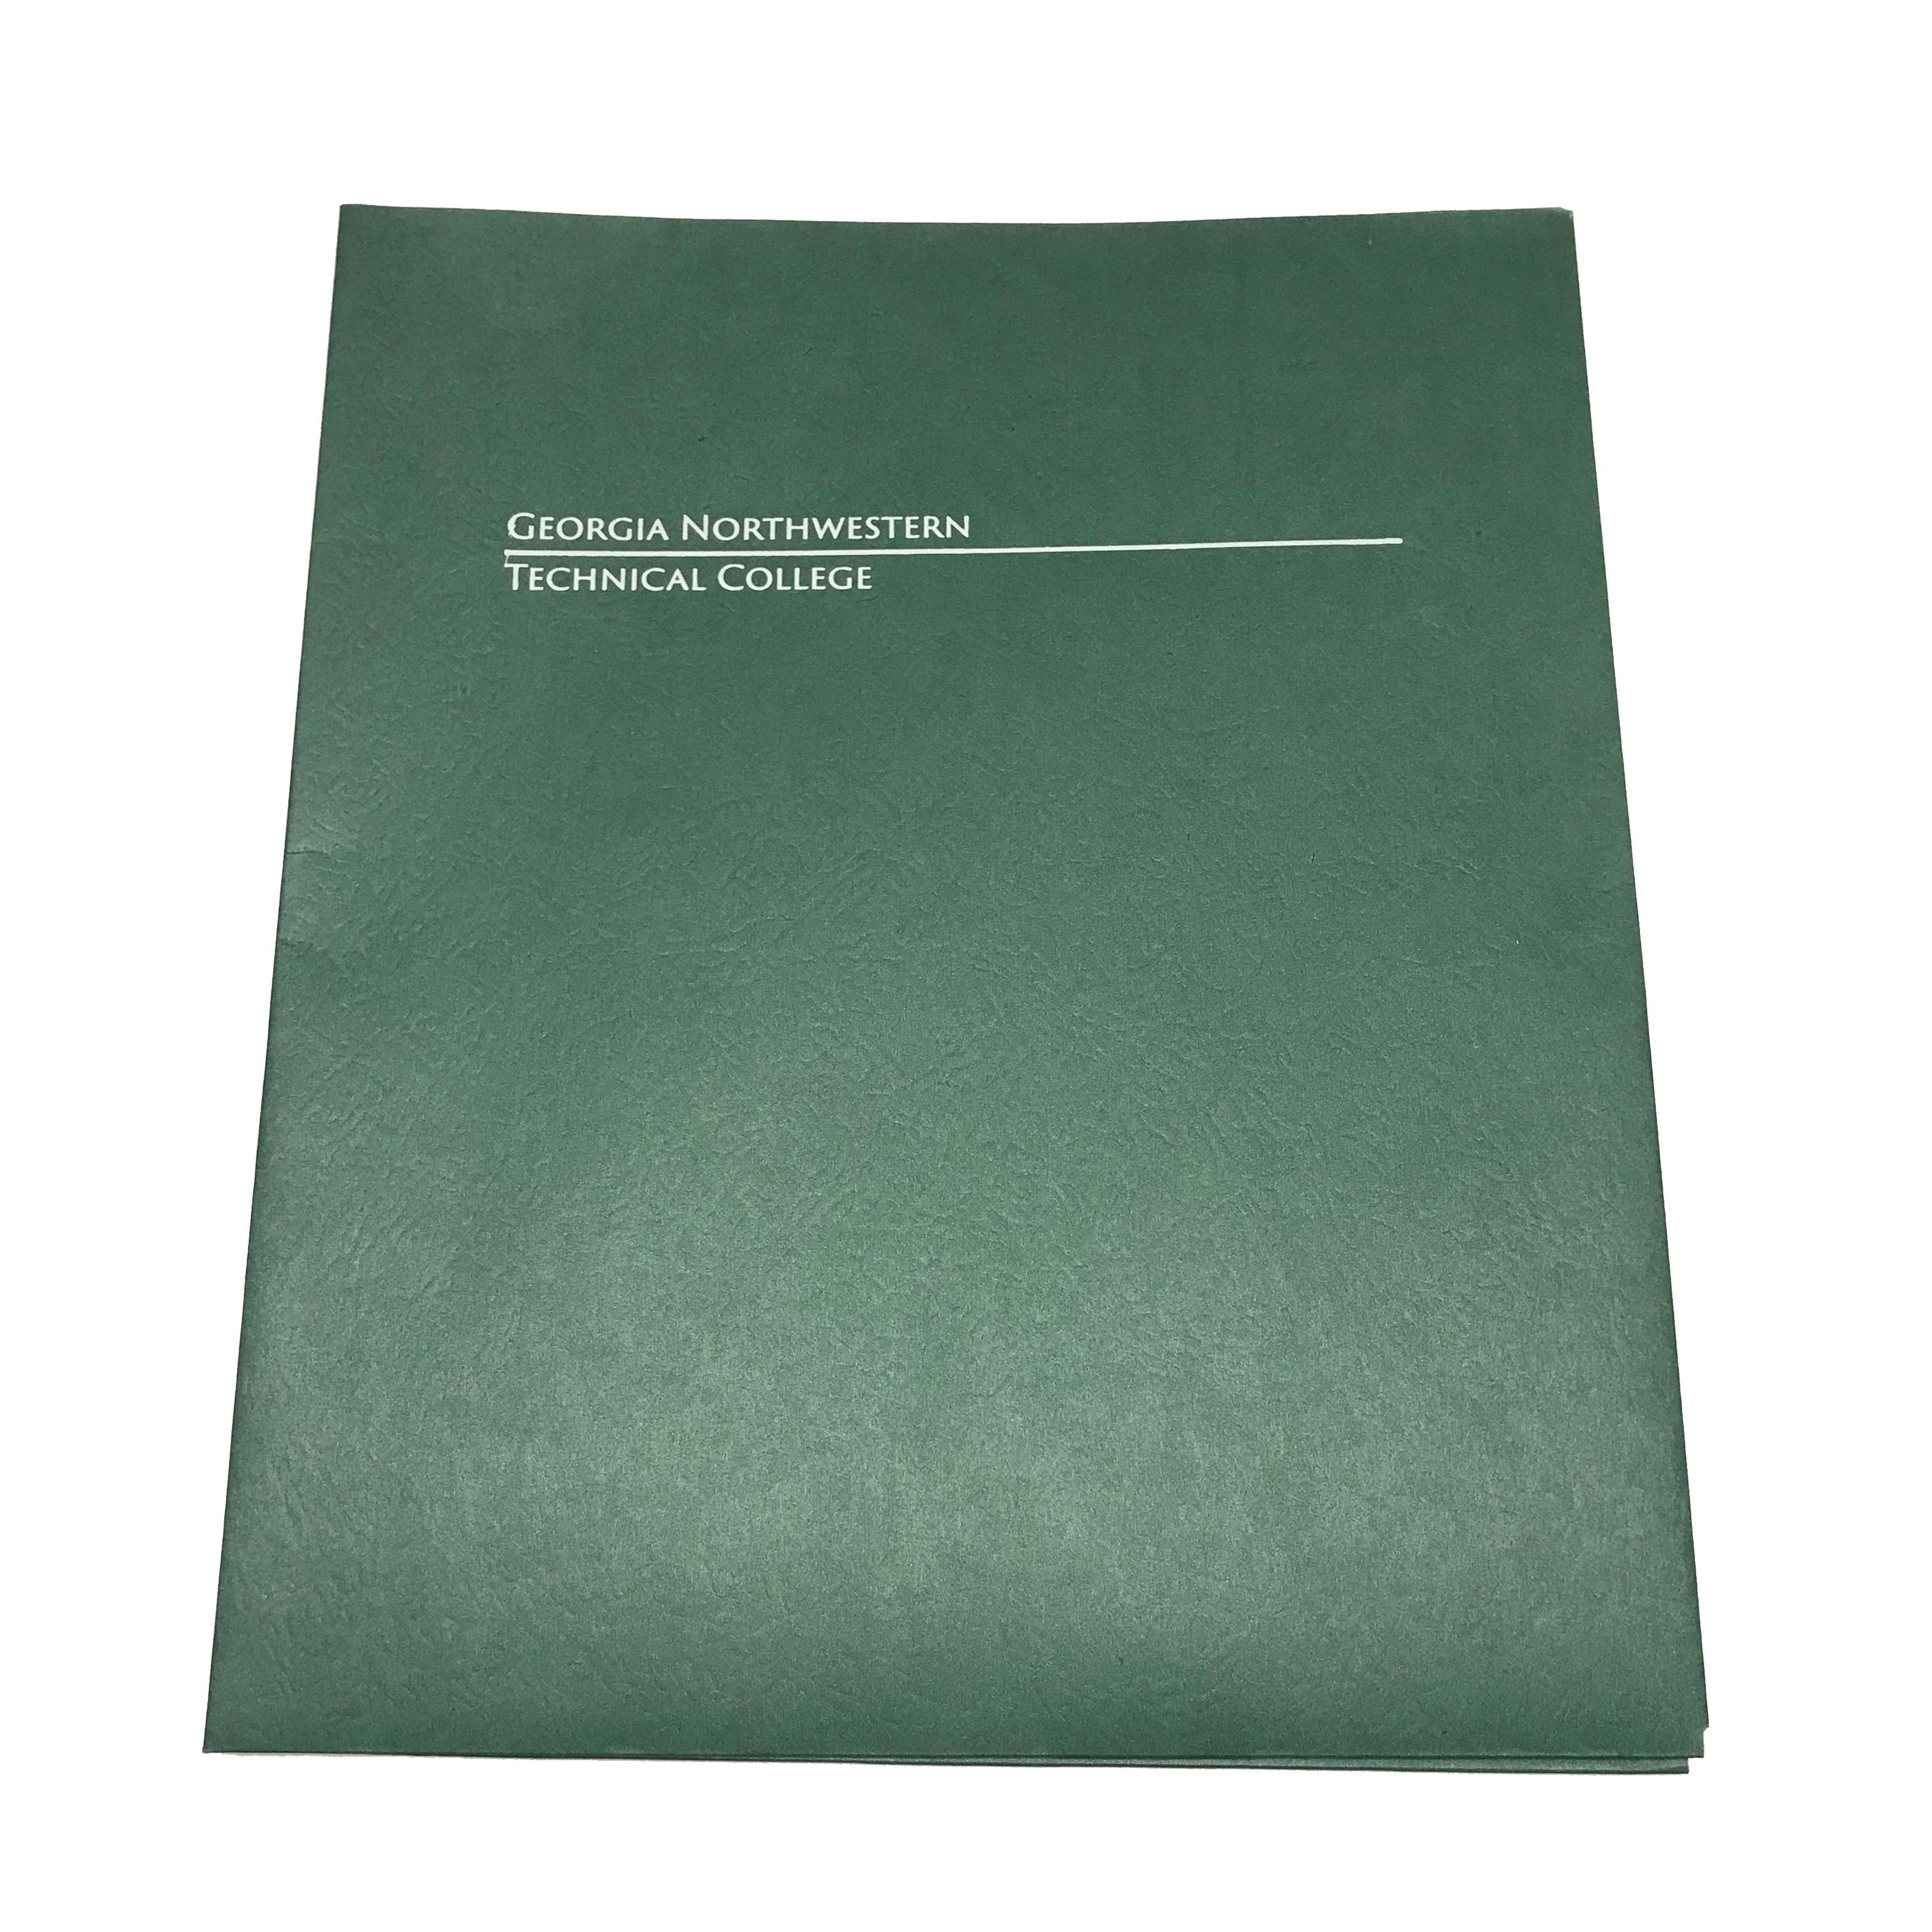 Georgia Northwestern Technical College Folder